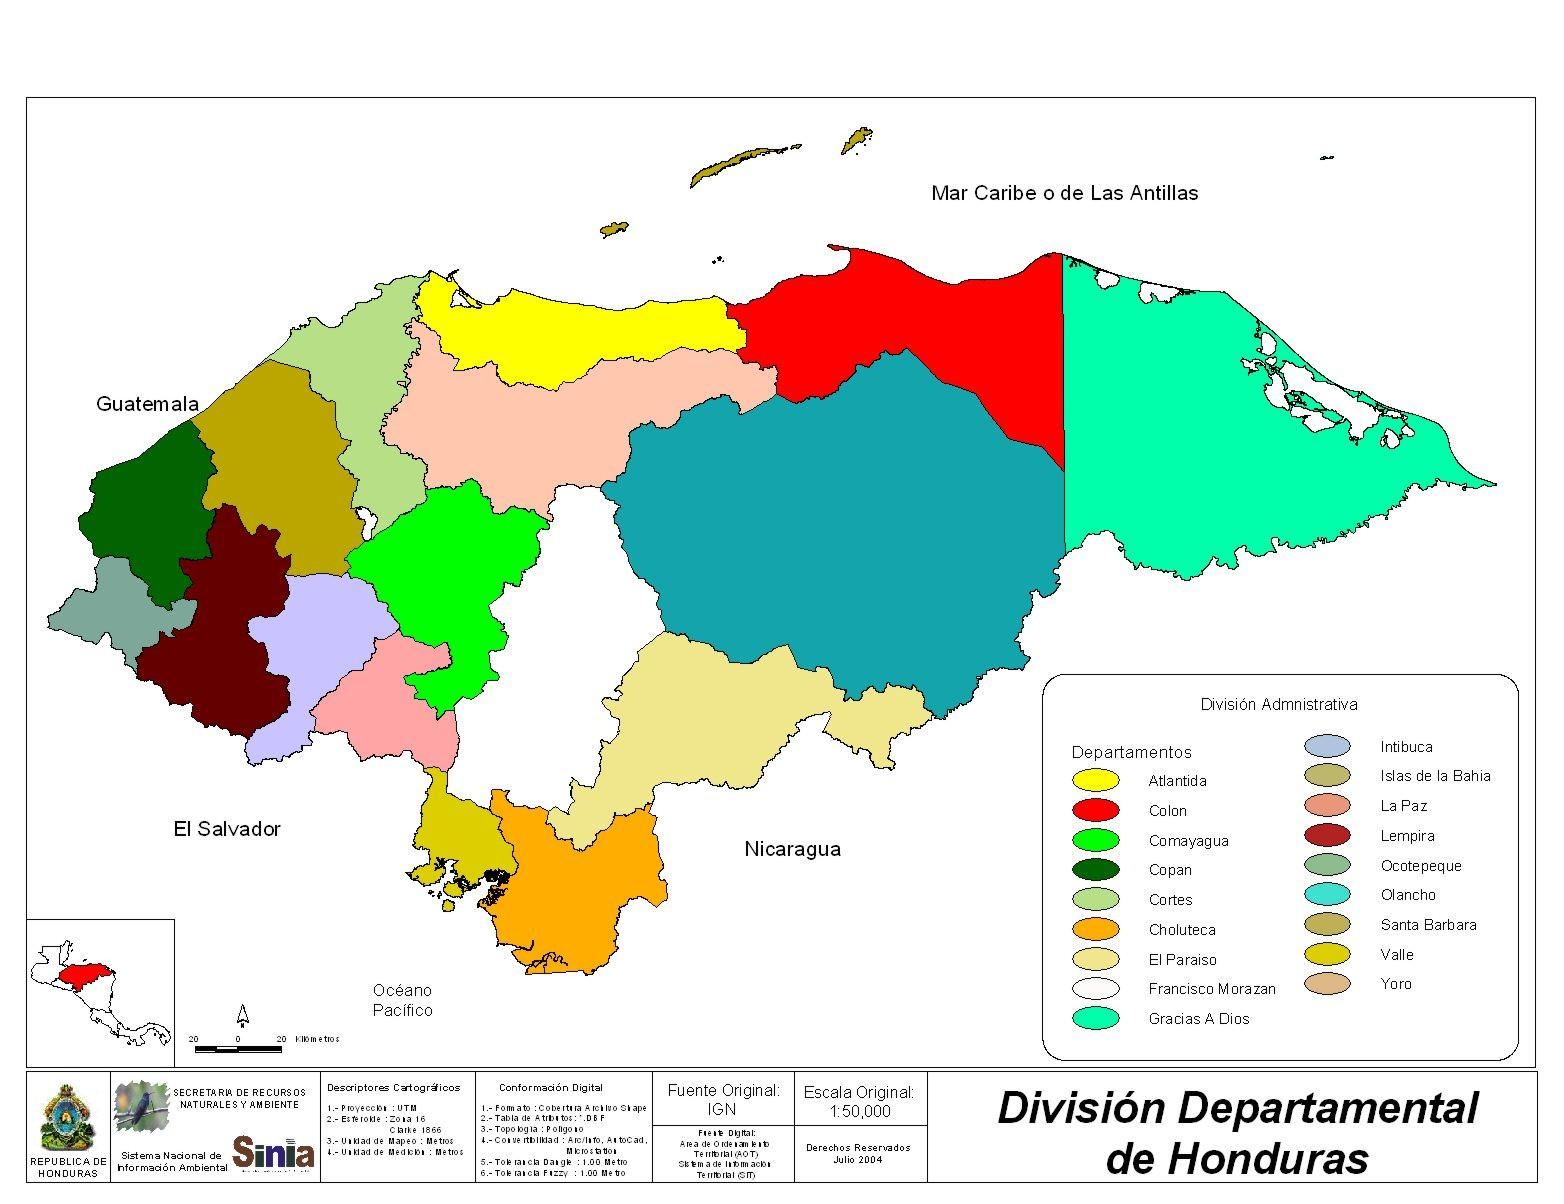 Honduras Departments Division Map